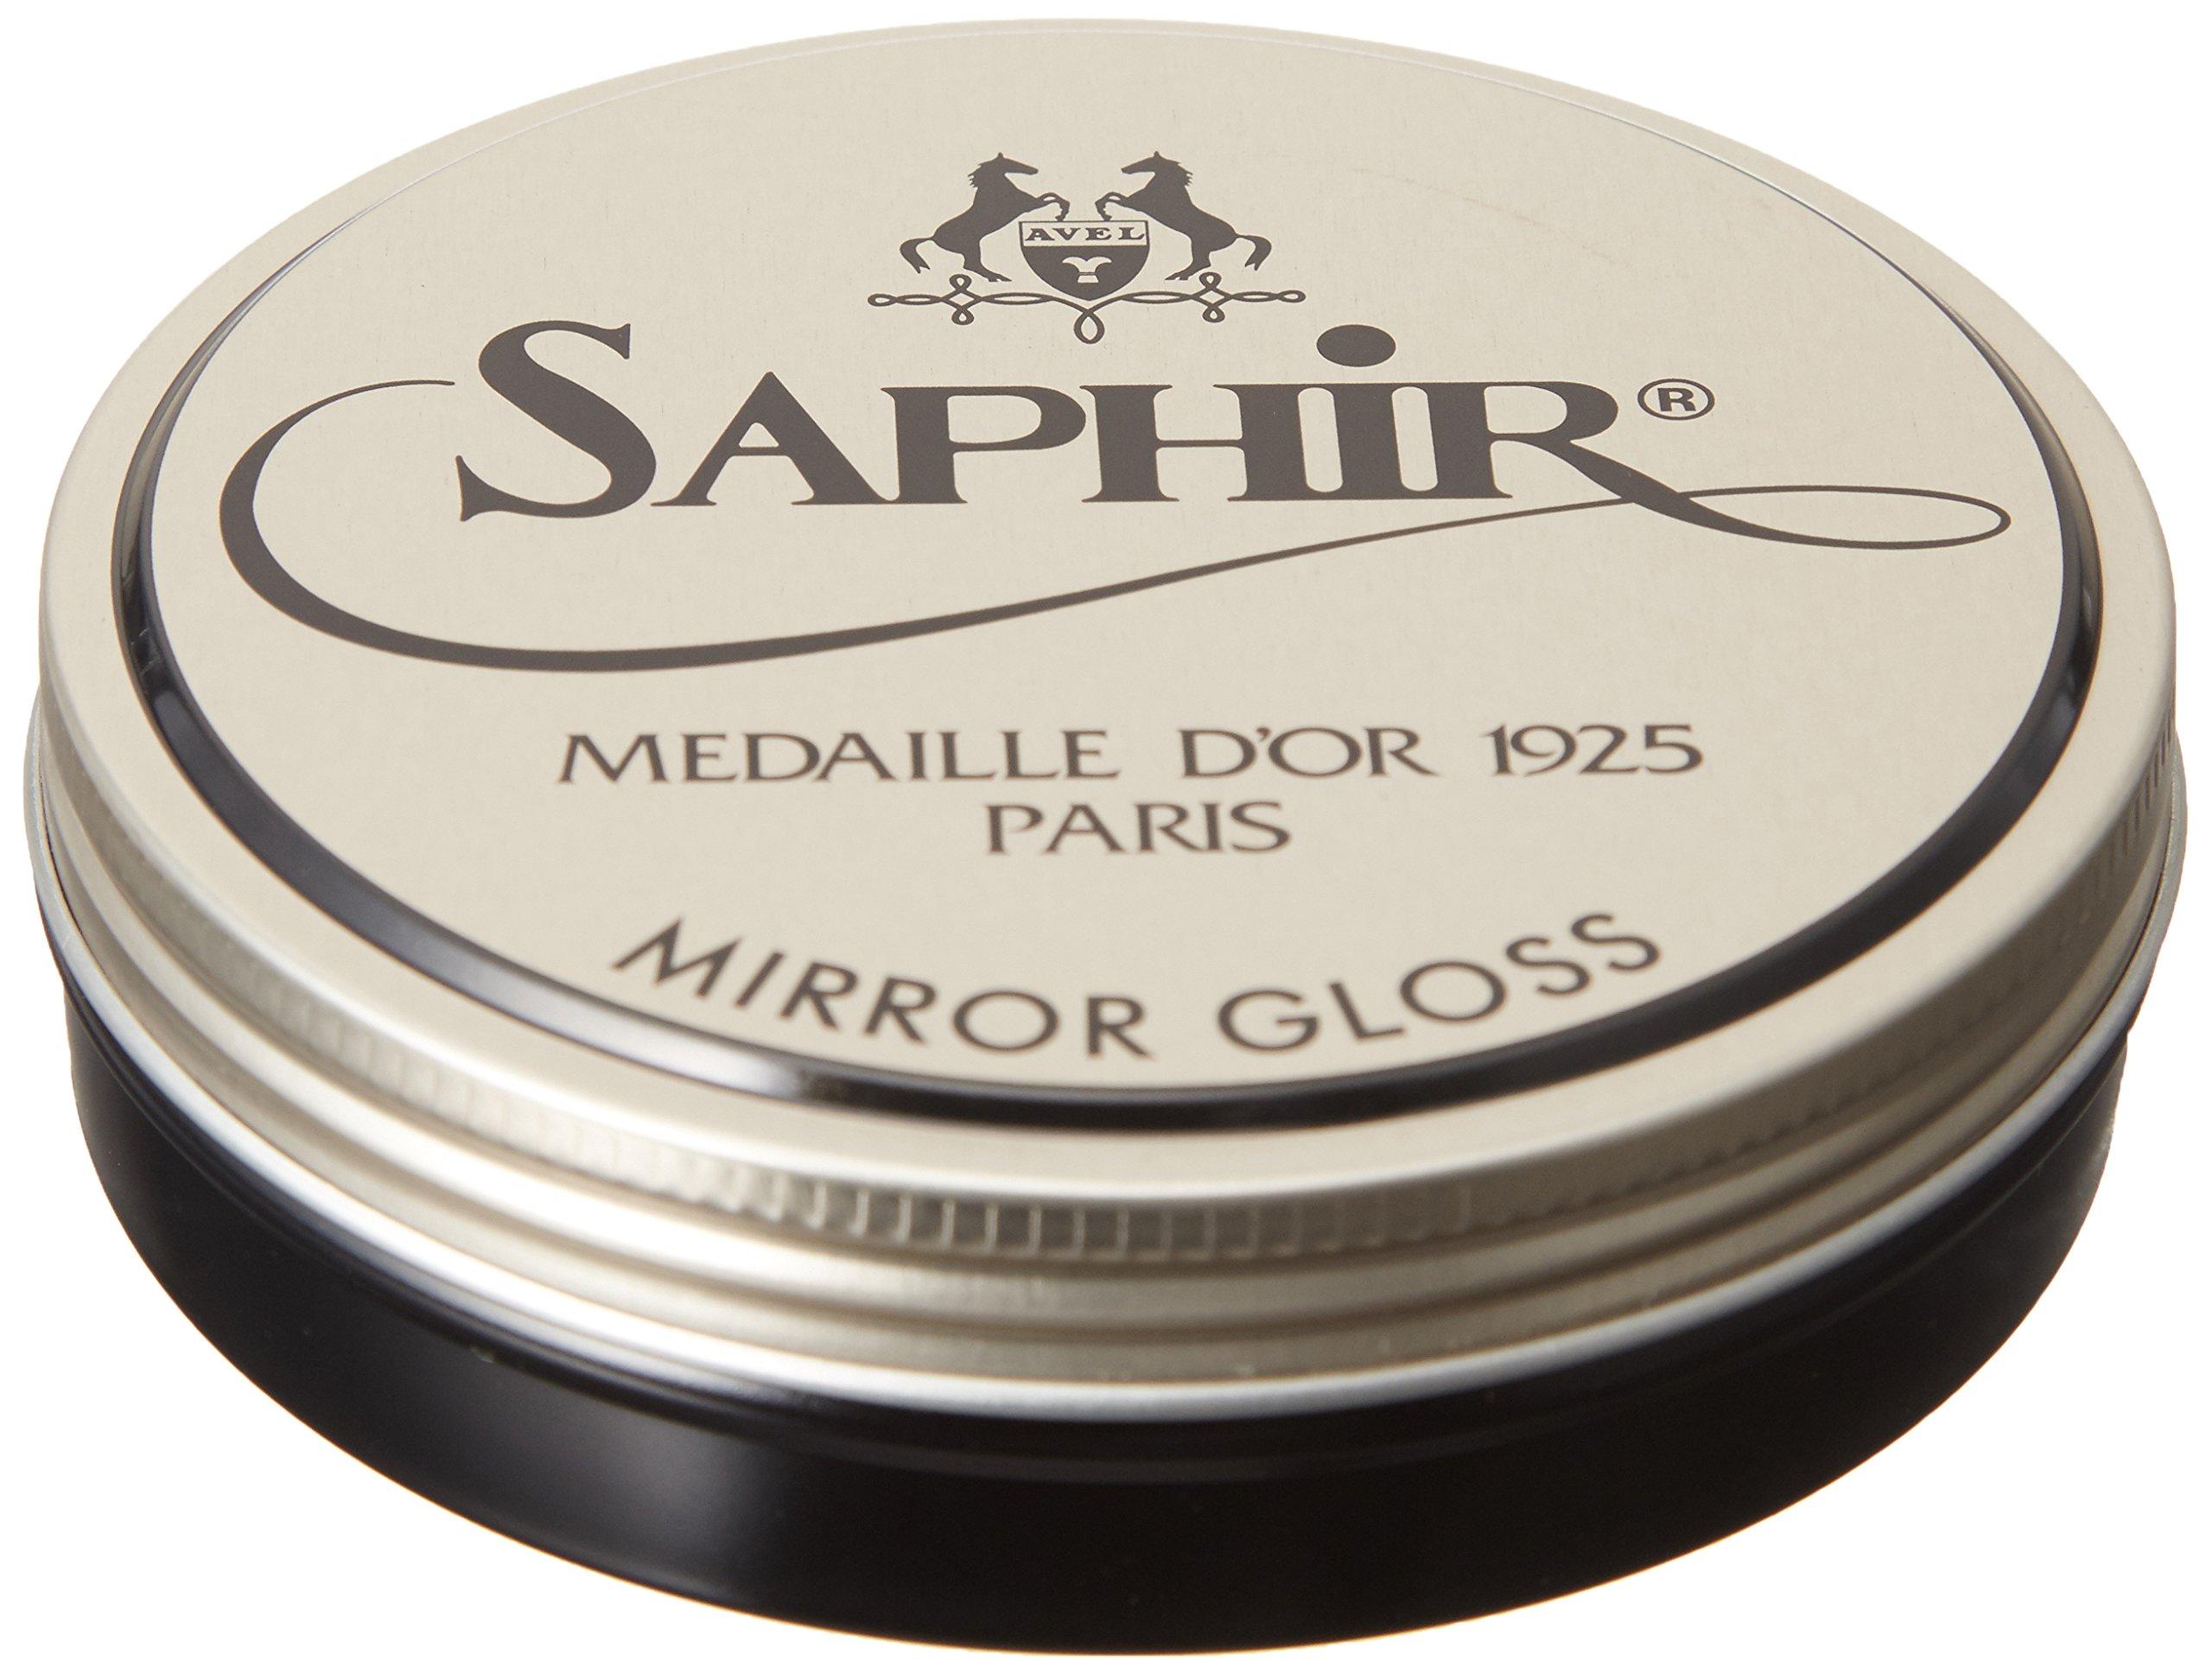 Saphir Medaille d'Or Mirror Gloss - Cera natural para zapato